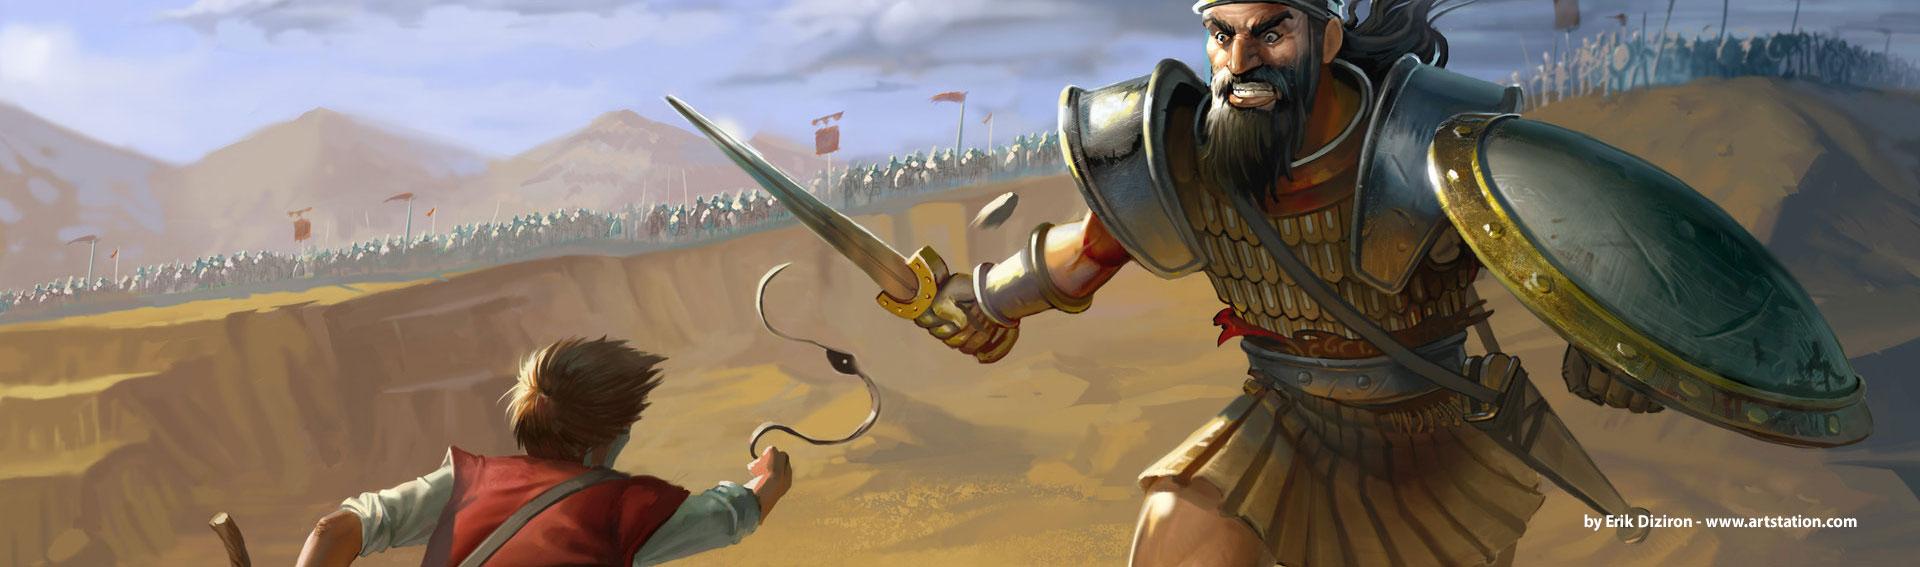 David & Goliath - The Art of Batteling Giants